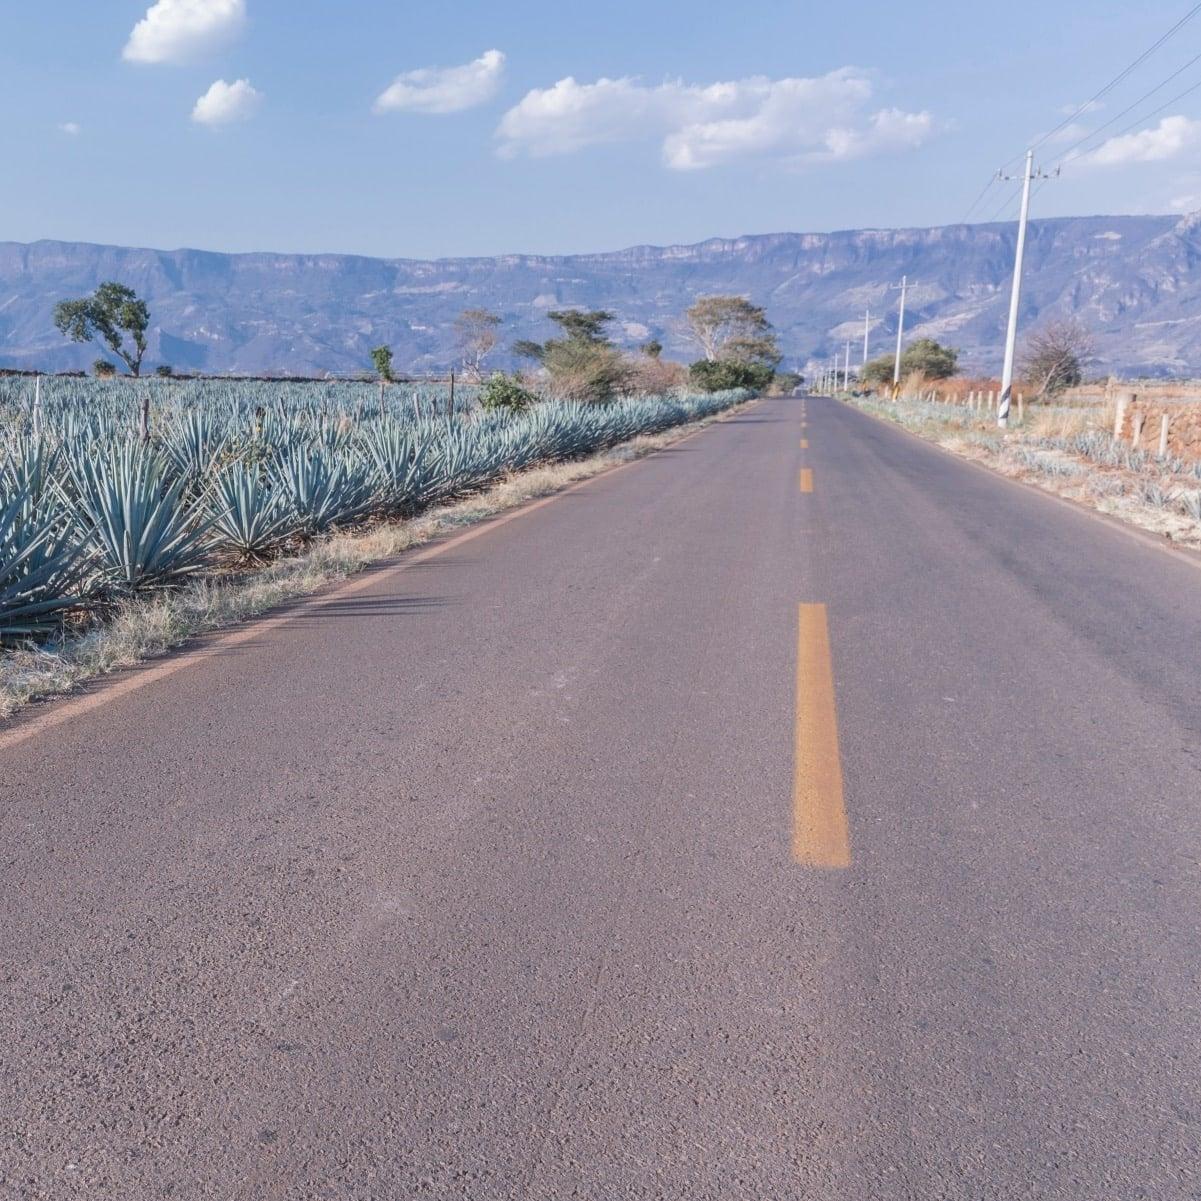 ruta del tequila en coche